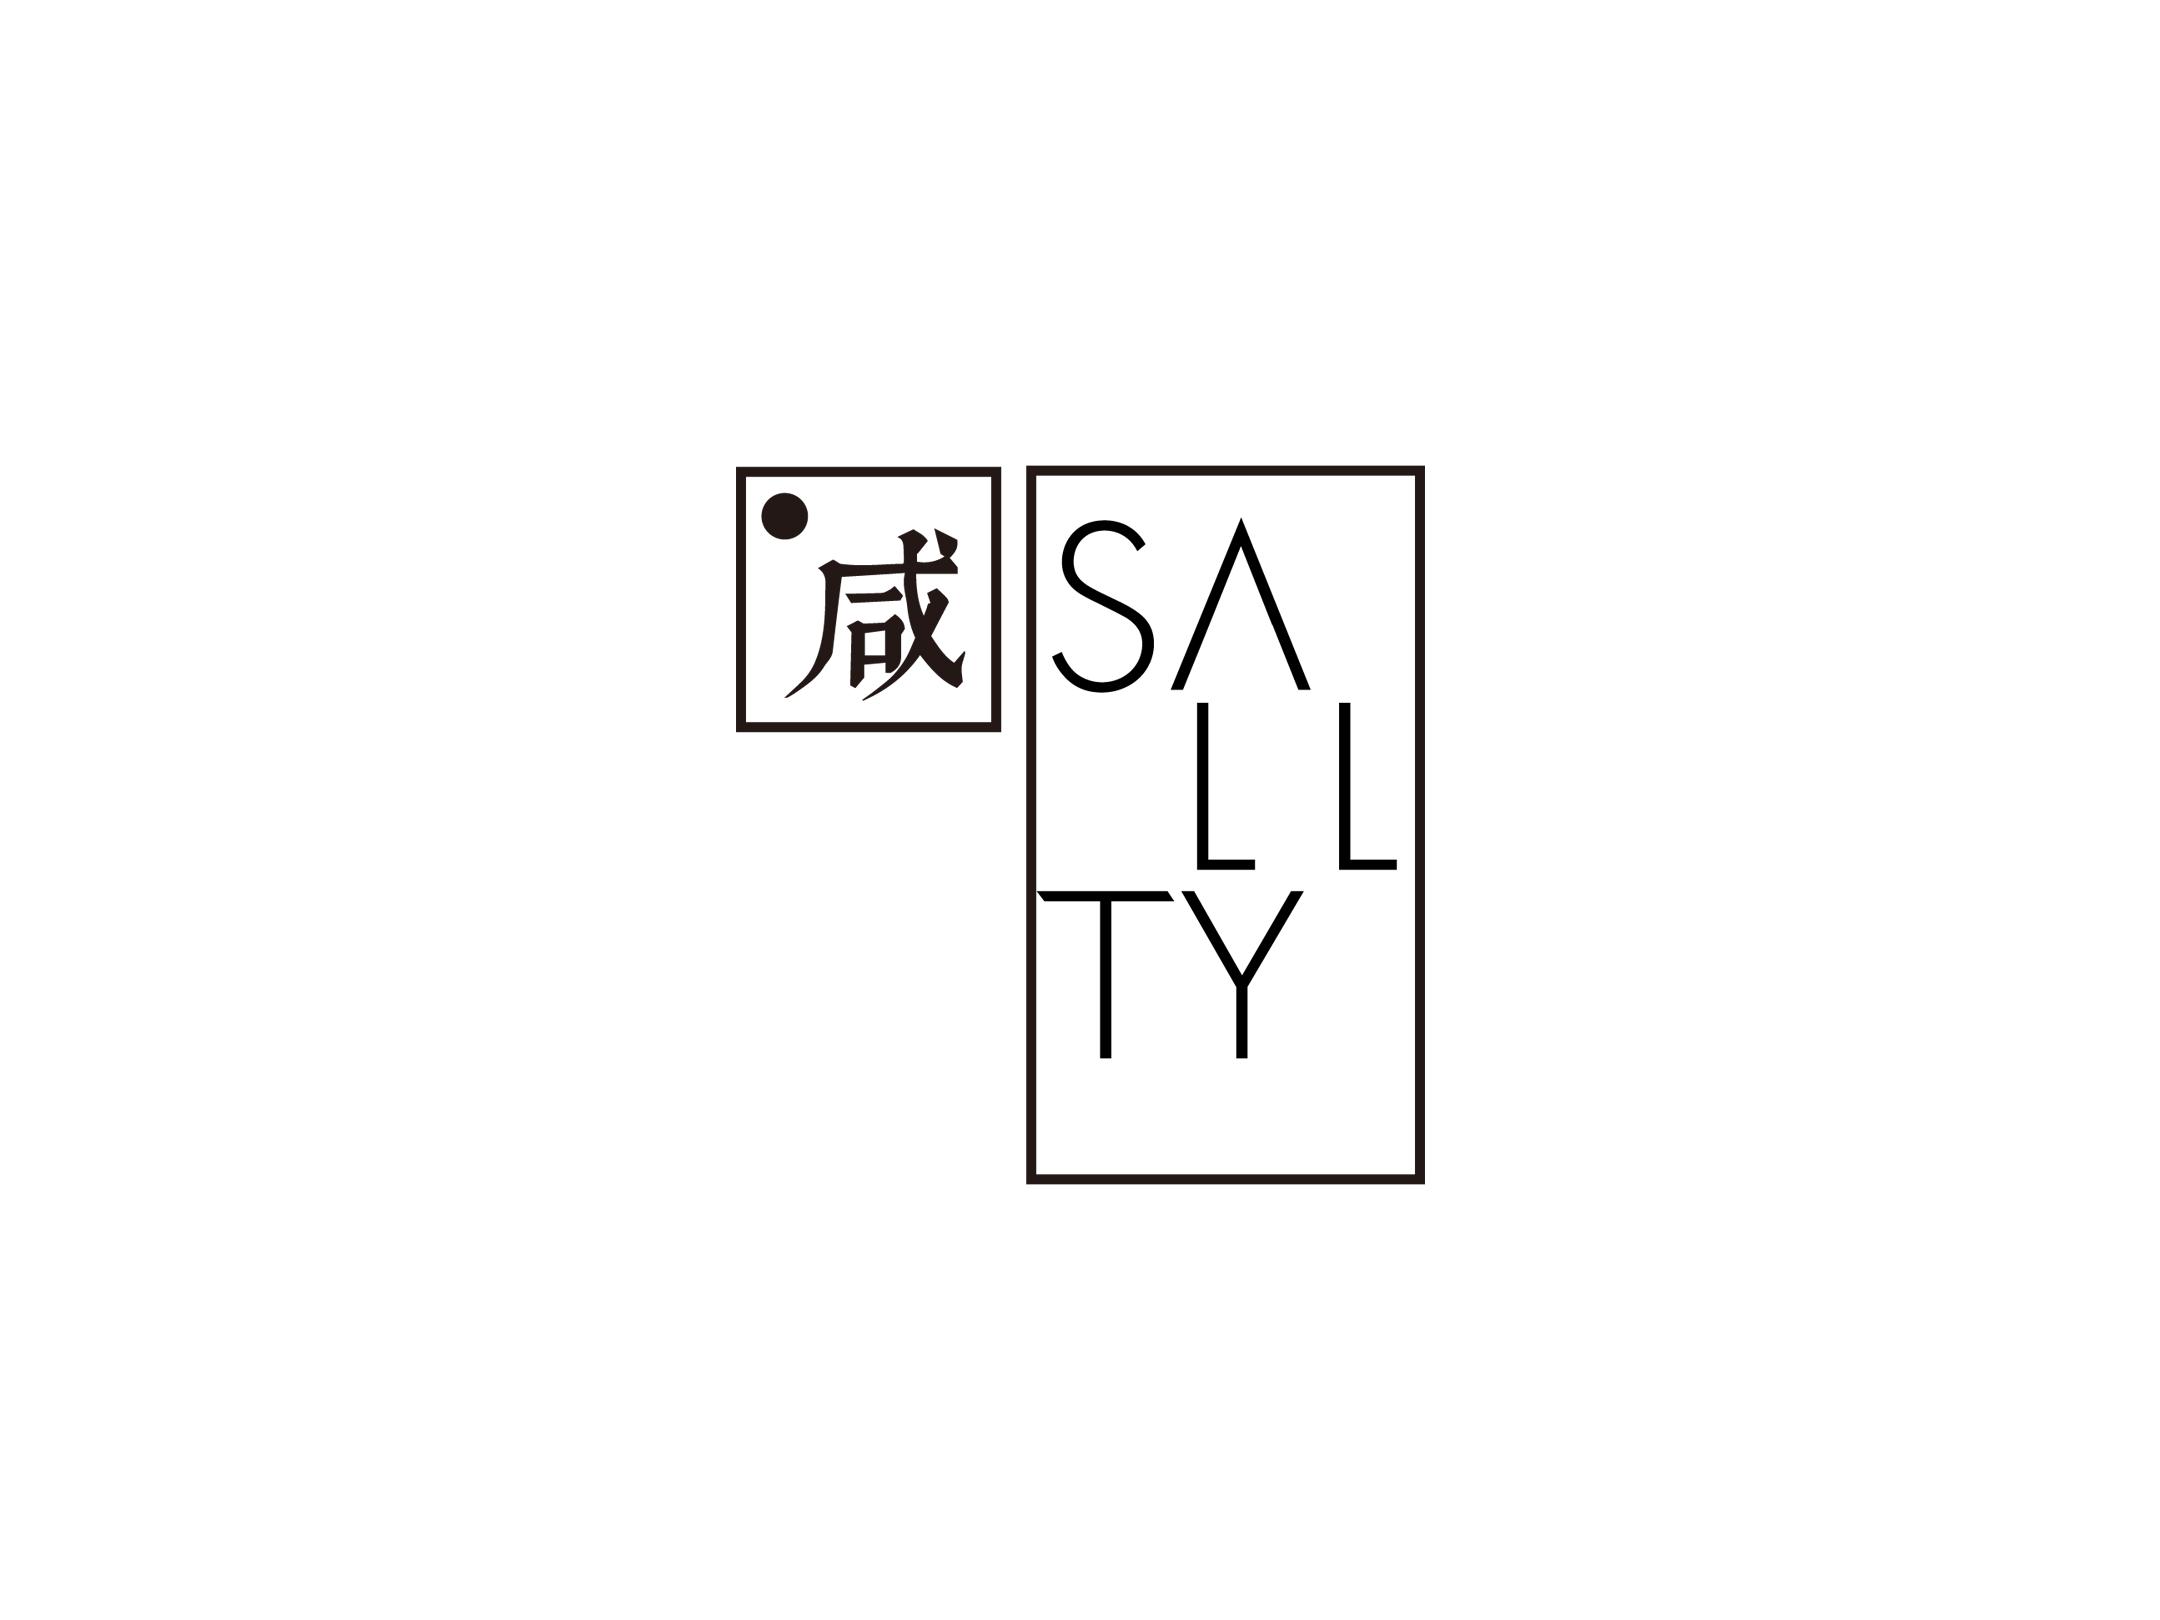 Sallty logo dribbble